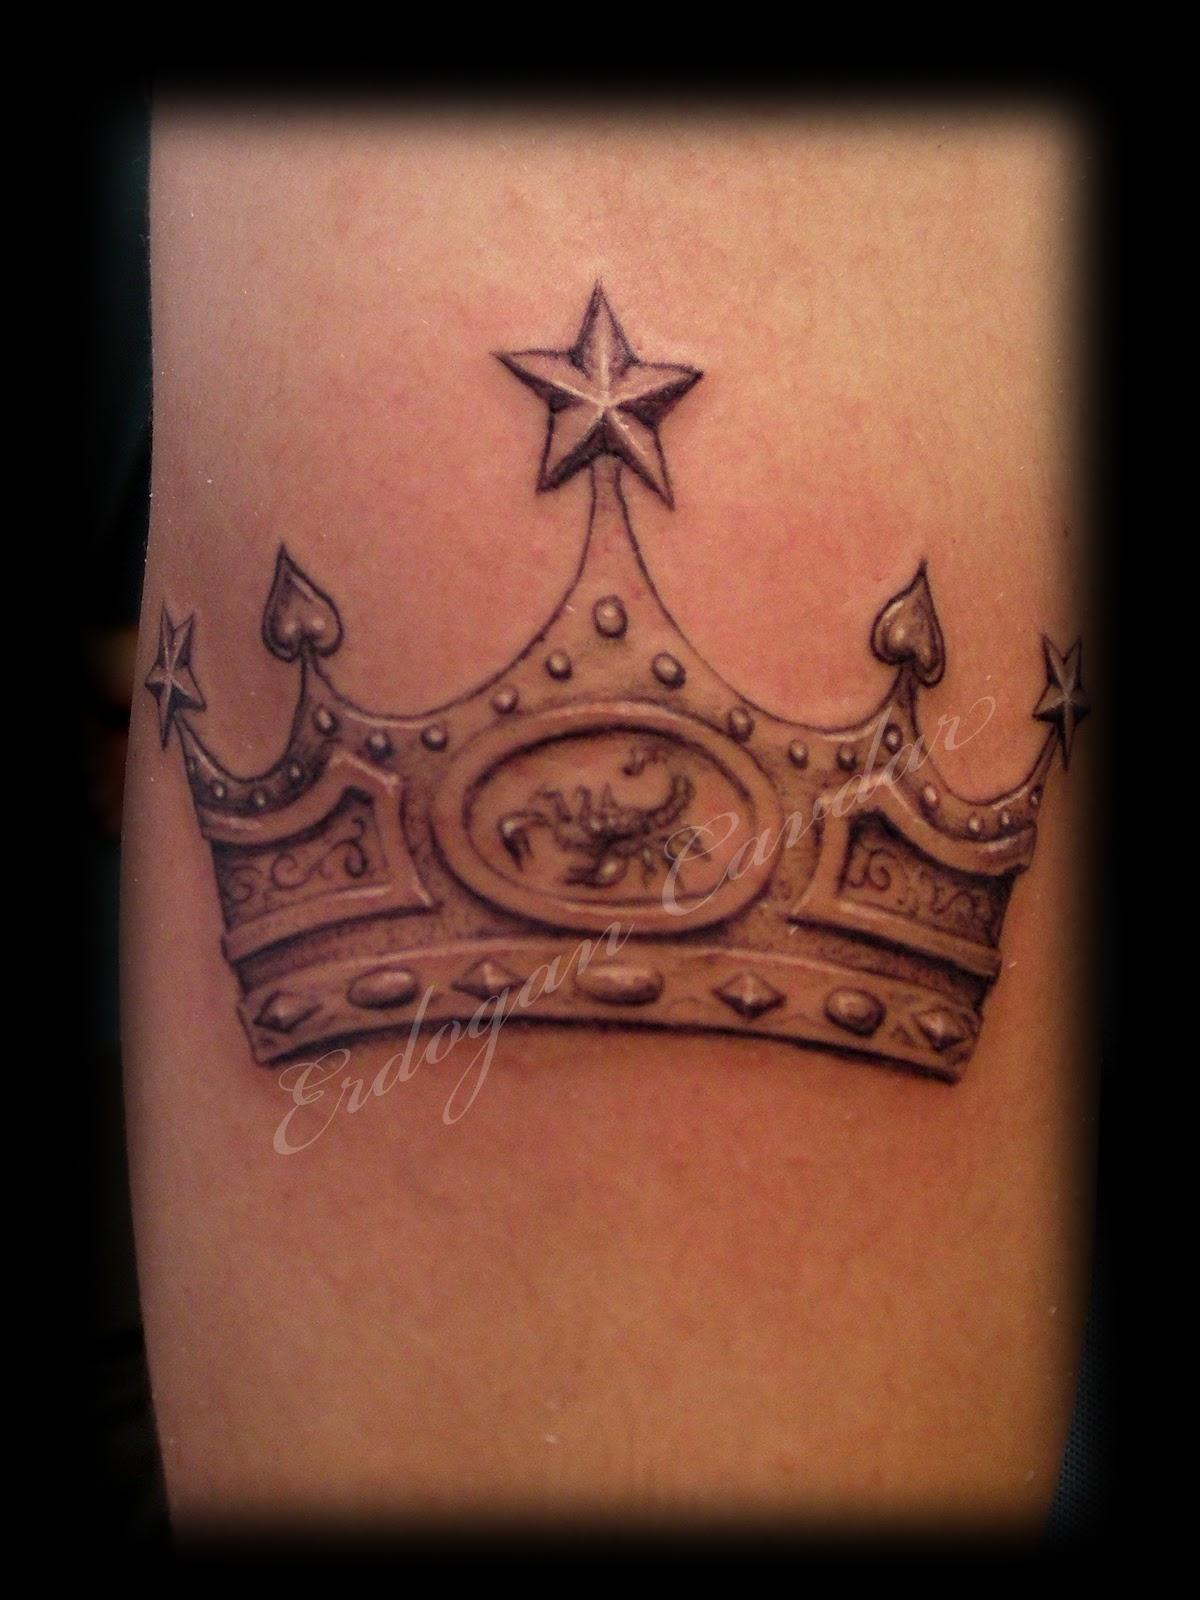 Татуировка корона рисунок фото